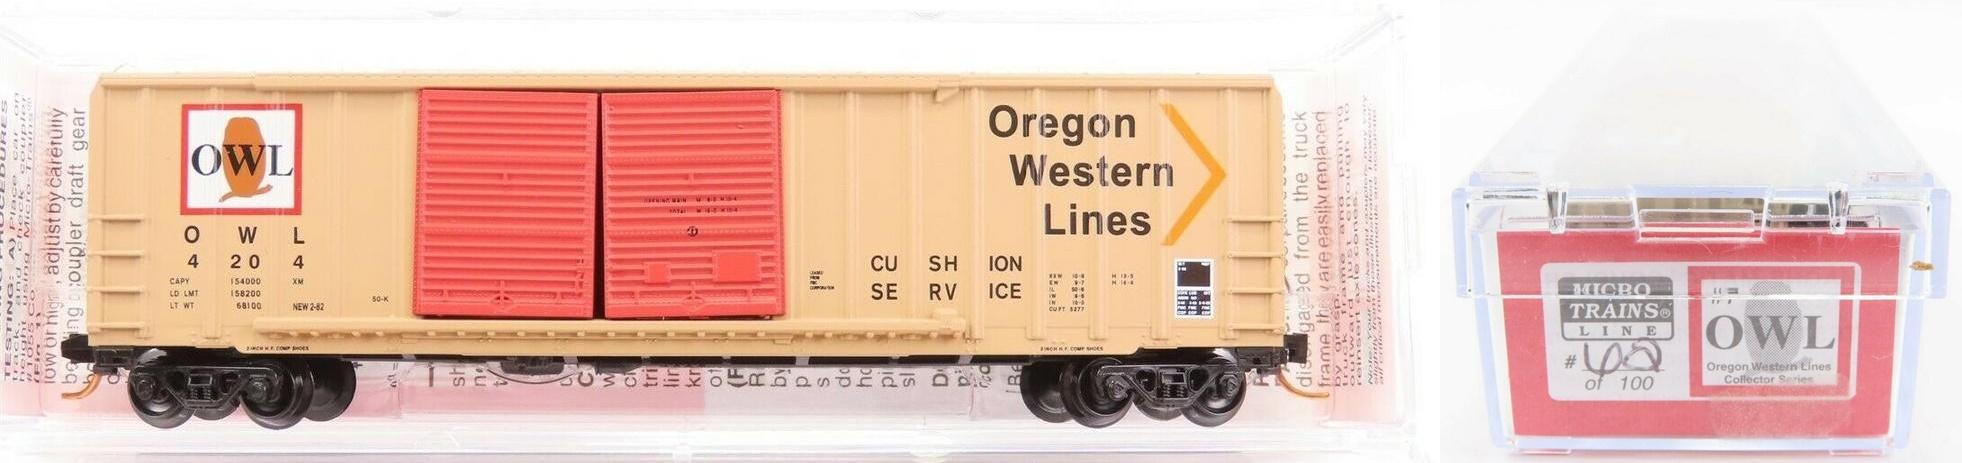 N Scale - Micro-Trains - NSC MTL 07-117 - Boxcar, 50 Foot, Steel - Oregon Western Lines - 4204